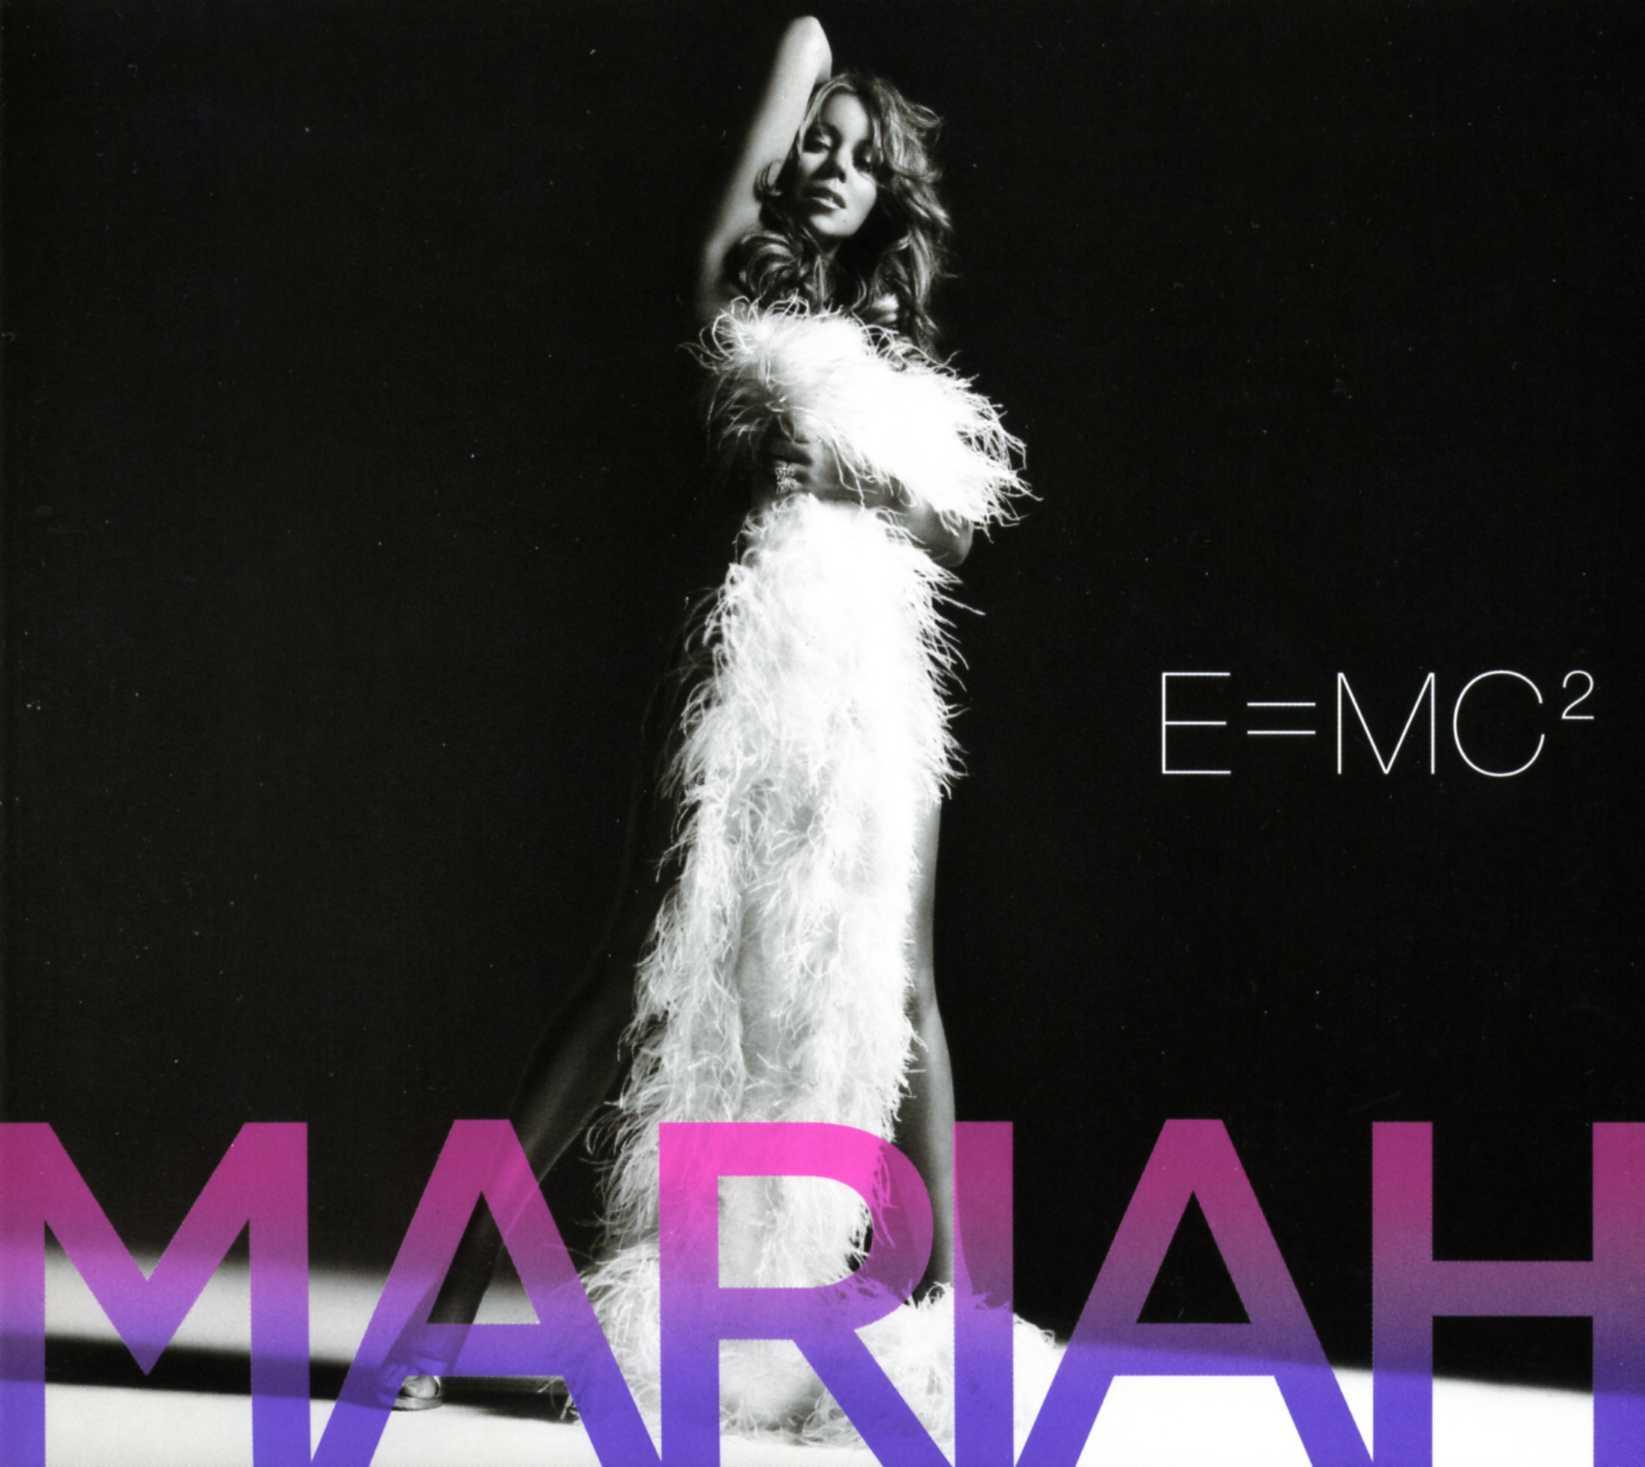 Mariah Carey Bye Bye profile picture